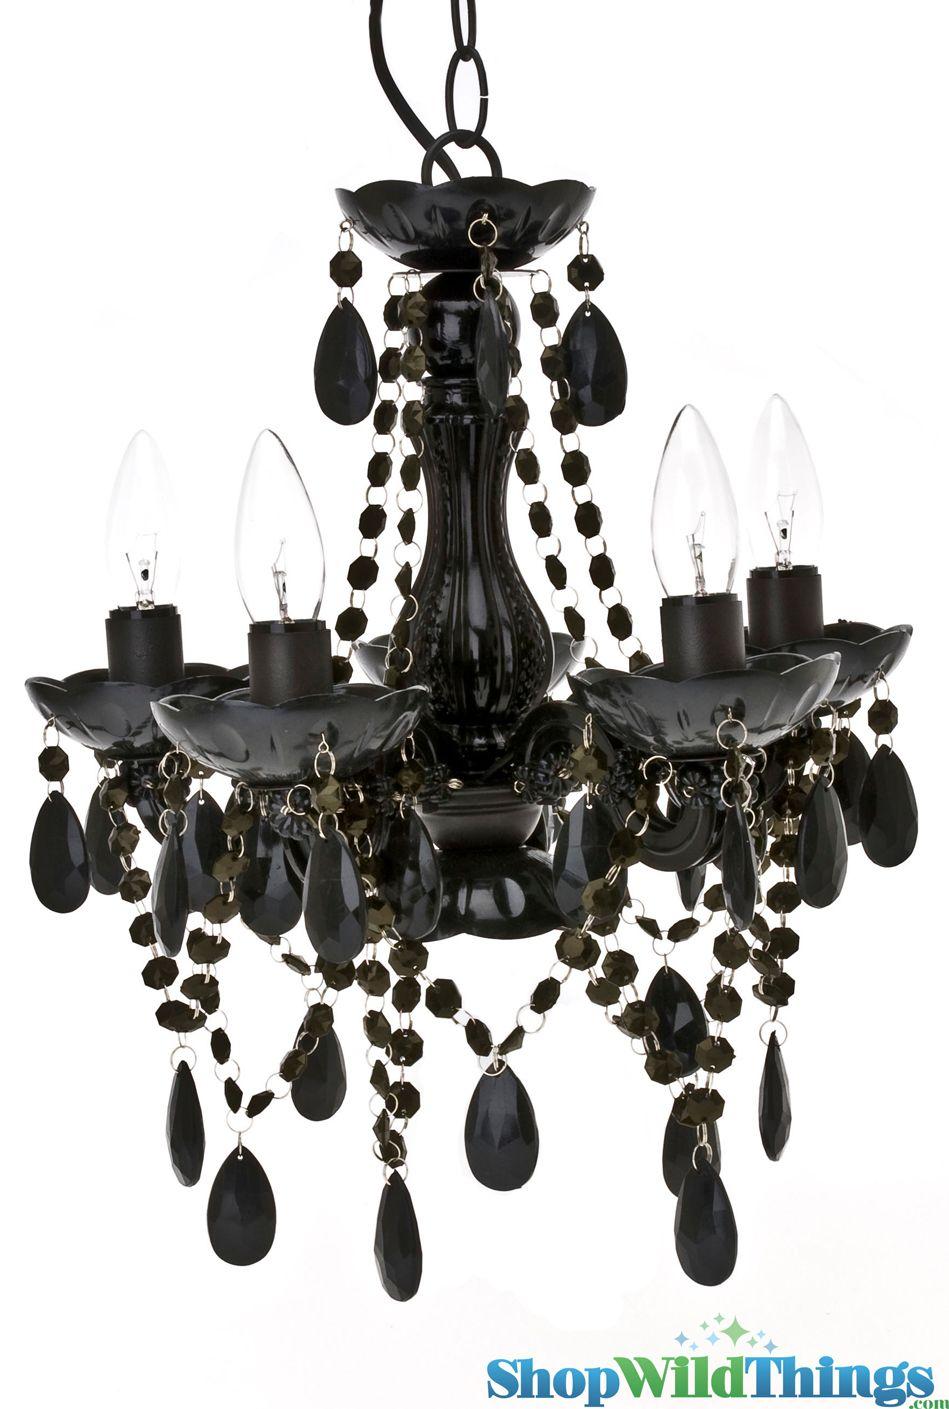 Plug In Or Convert To Hard Wire Acrylic Metal Glass Resin15 X 11 The Shopwildthings Tango Black Chandelier Gothic Chandelier Chandelier Ceiling Lights